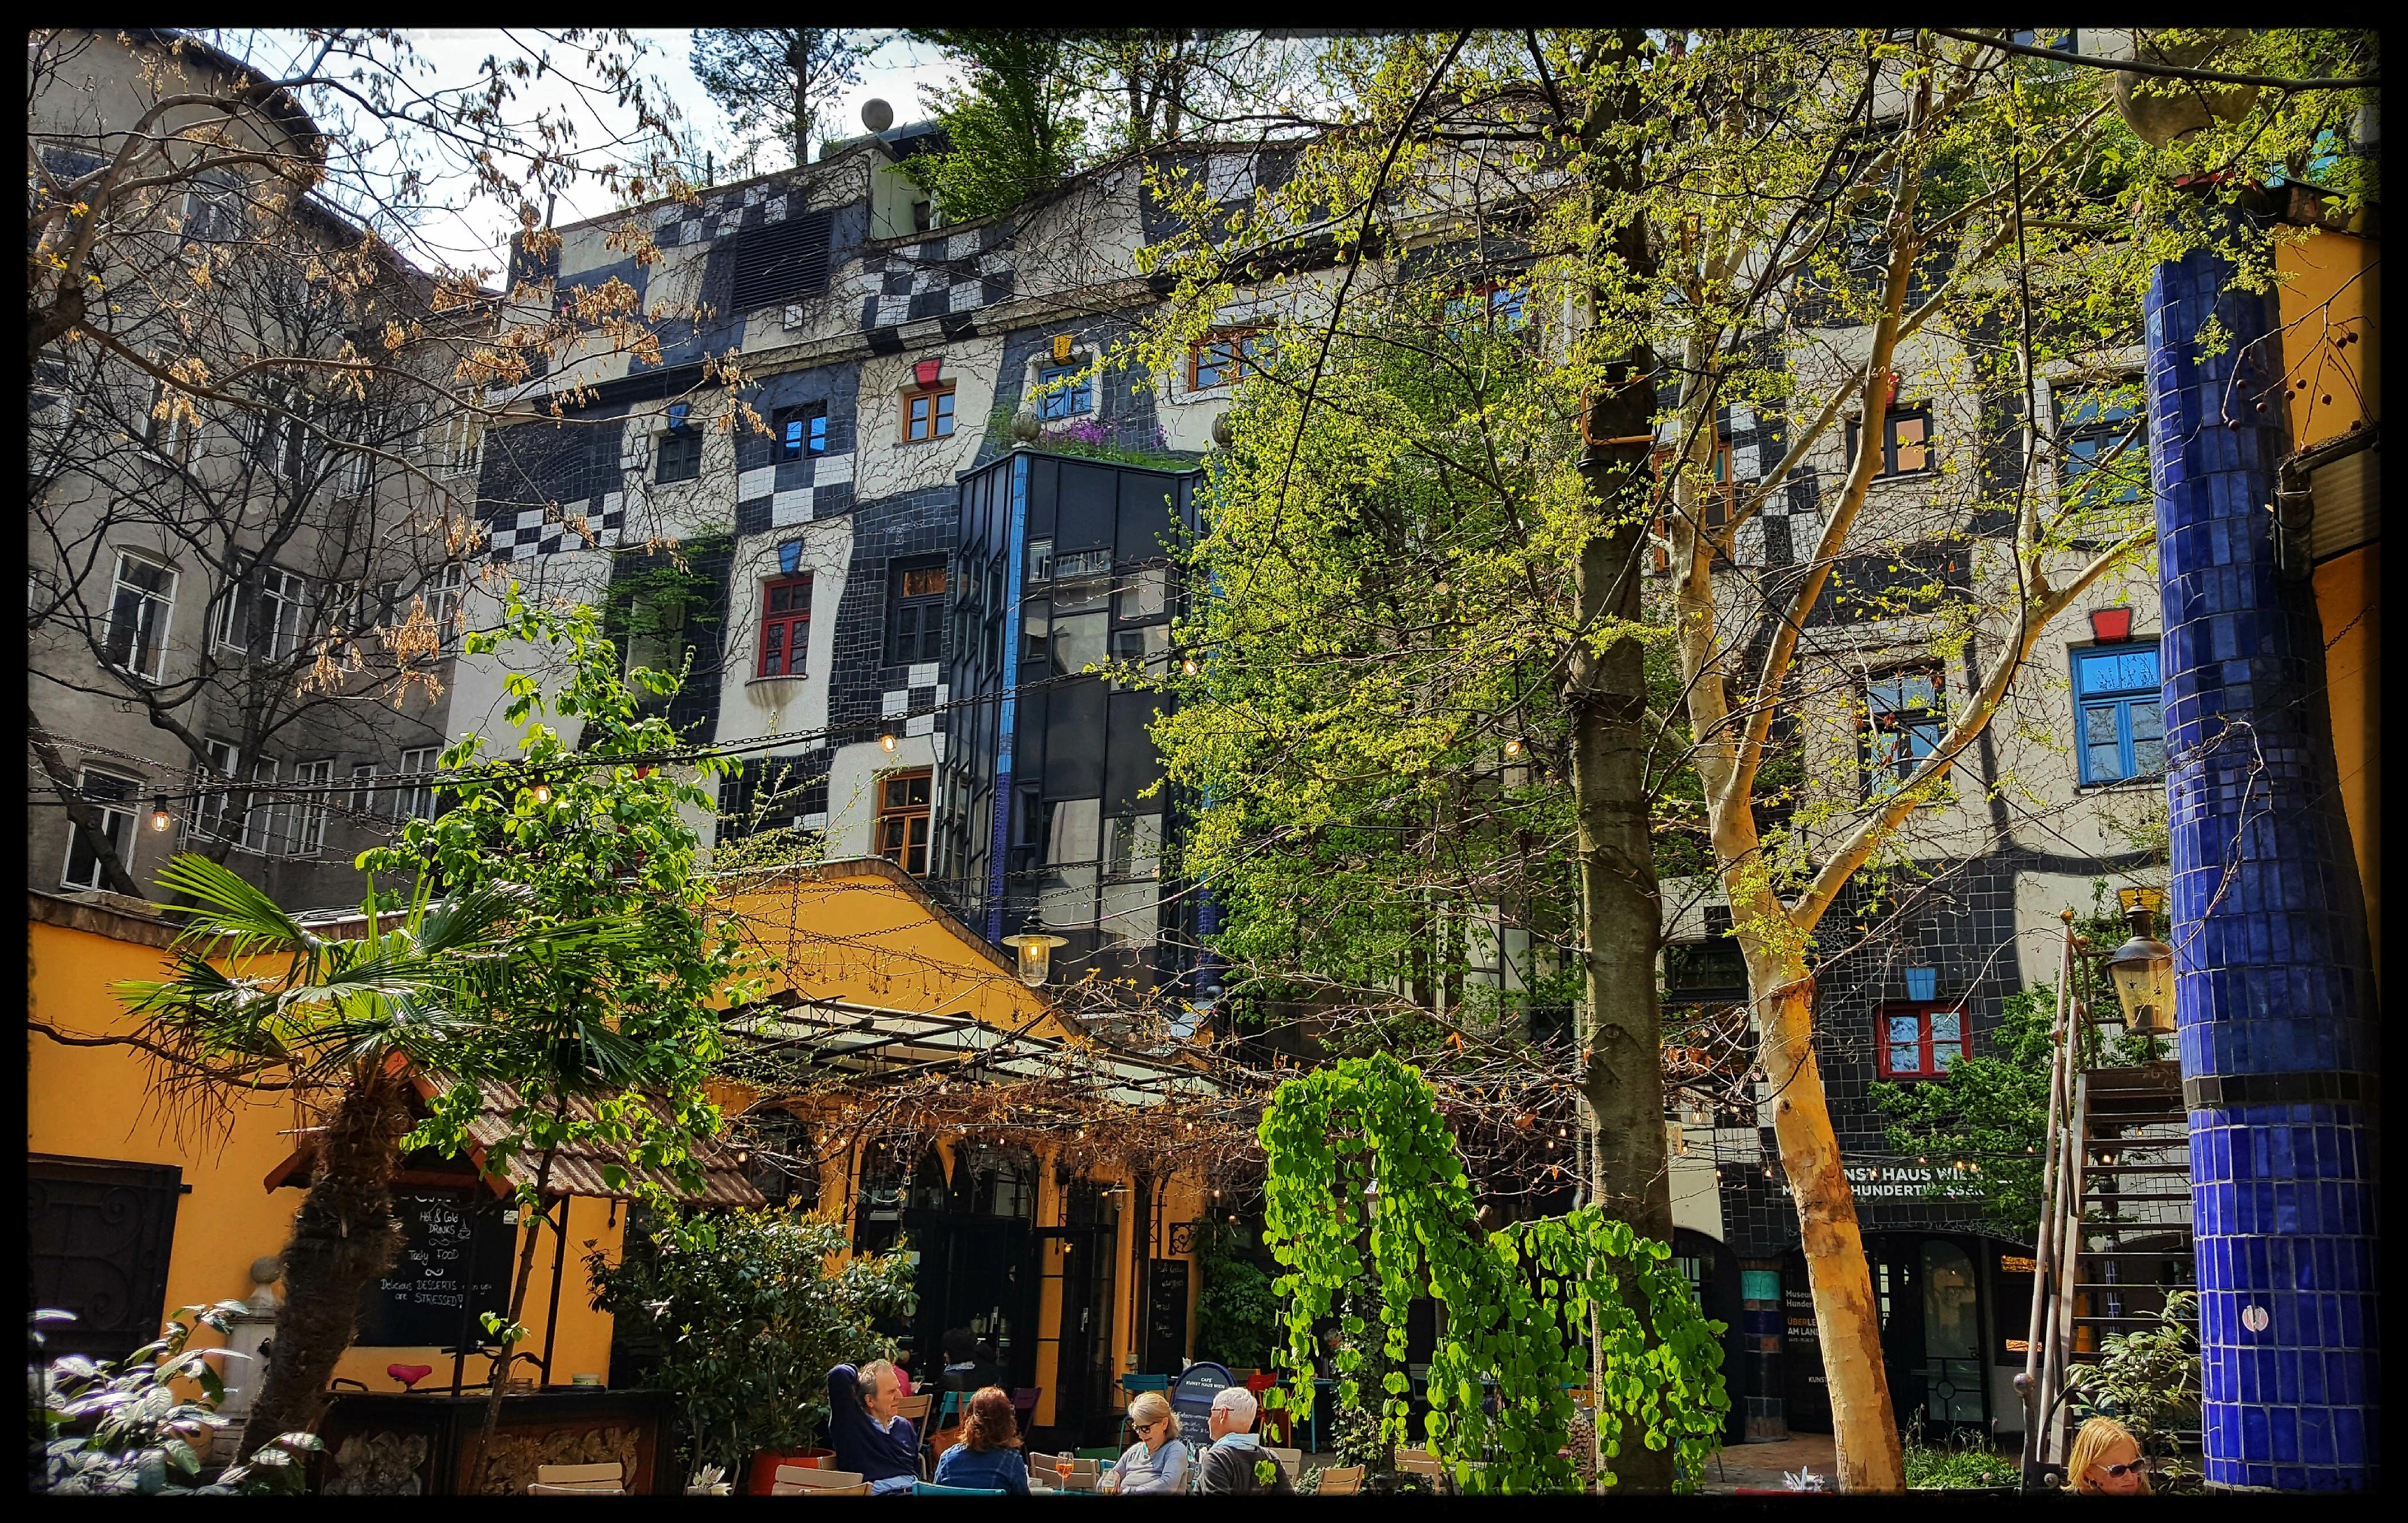 Garden Cafe at Museum Hundertwasser. Photo by Dragonfly Leathrum